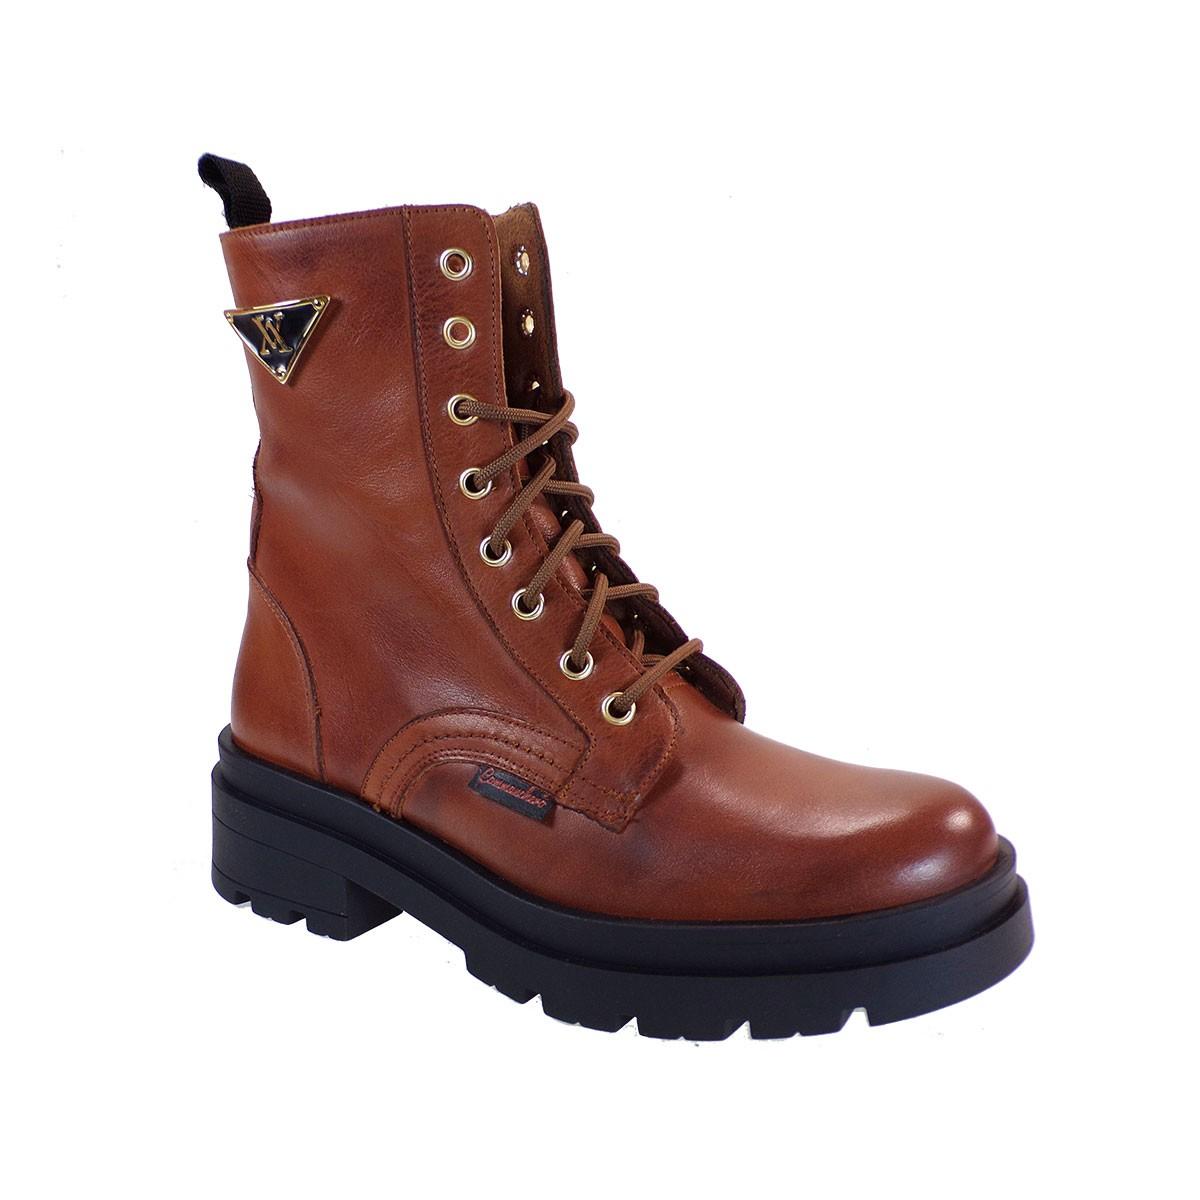 Commanchero Γυναικεία Παπούτσια Μποτάκια Αρβυλάκια 5797-726 Ταμπά Δέρμα